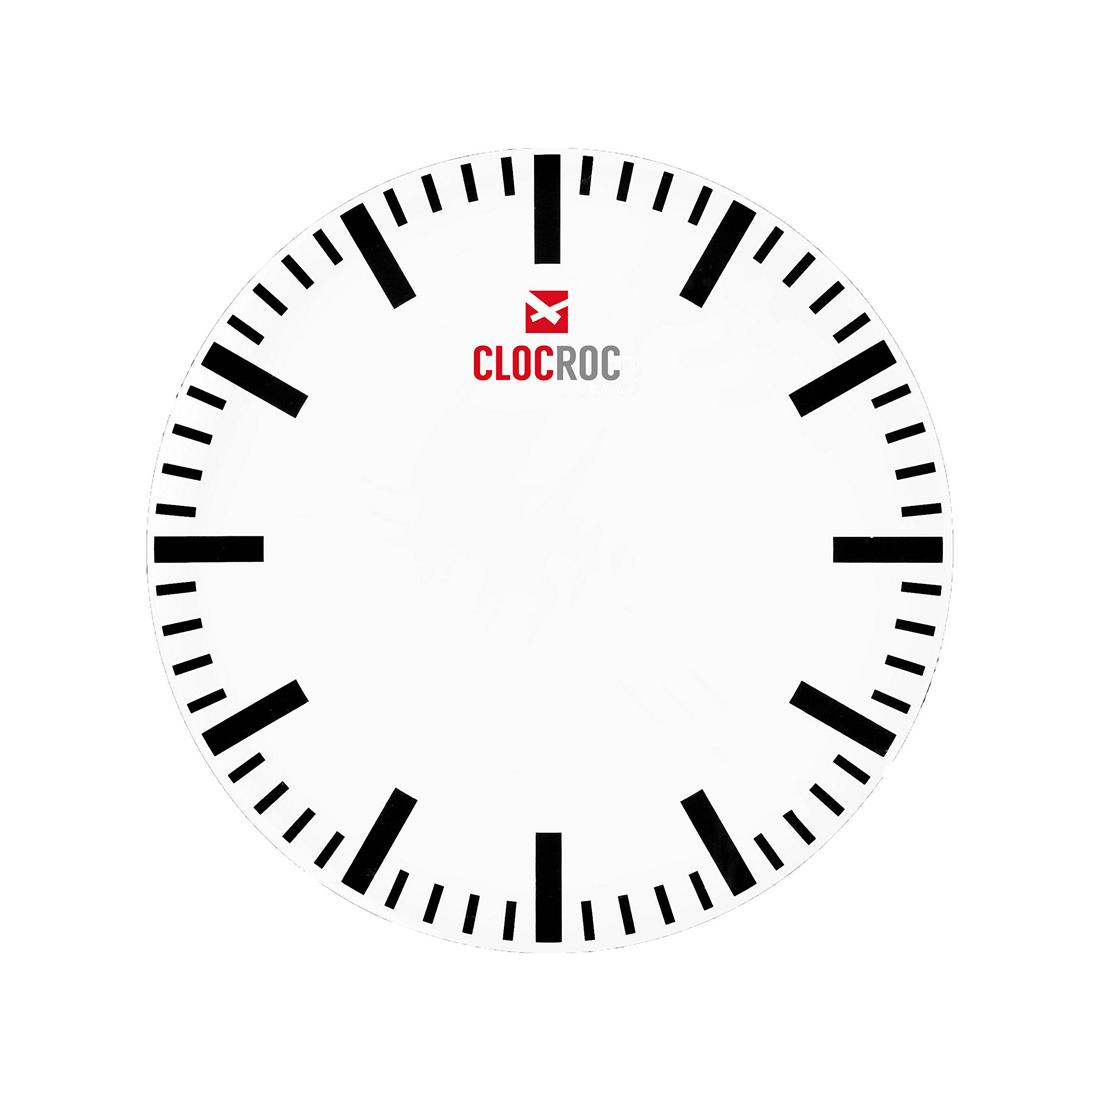 Zifferblatt Uhr Reloj Esferas